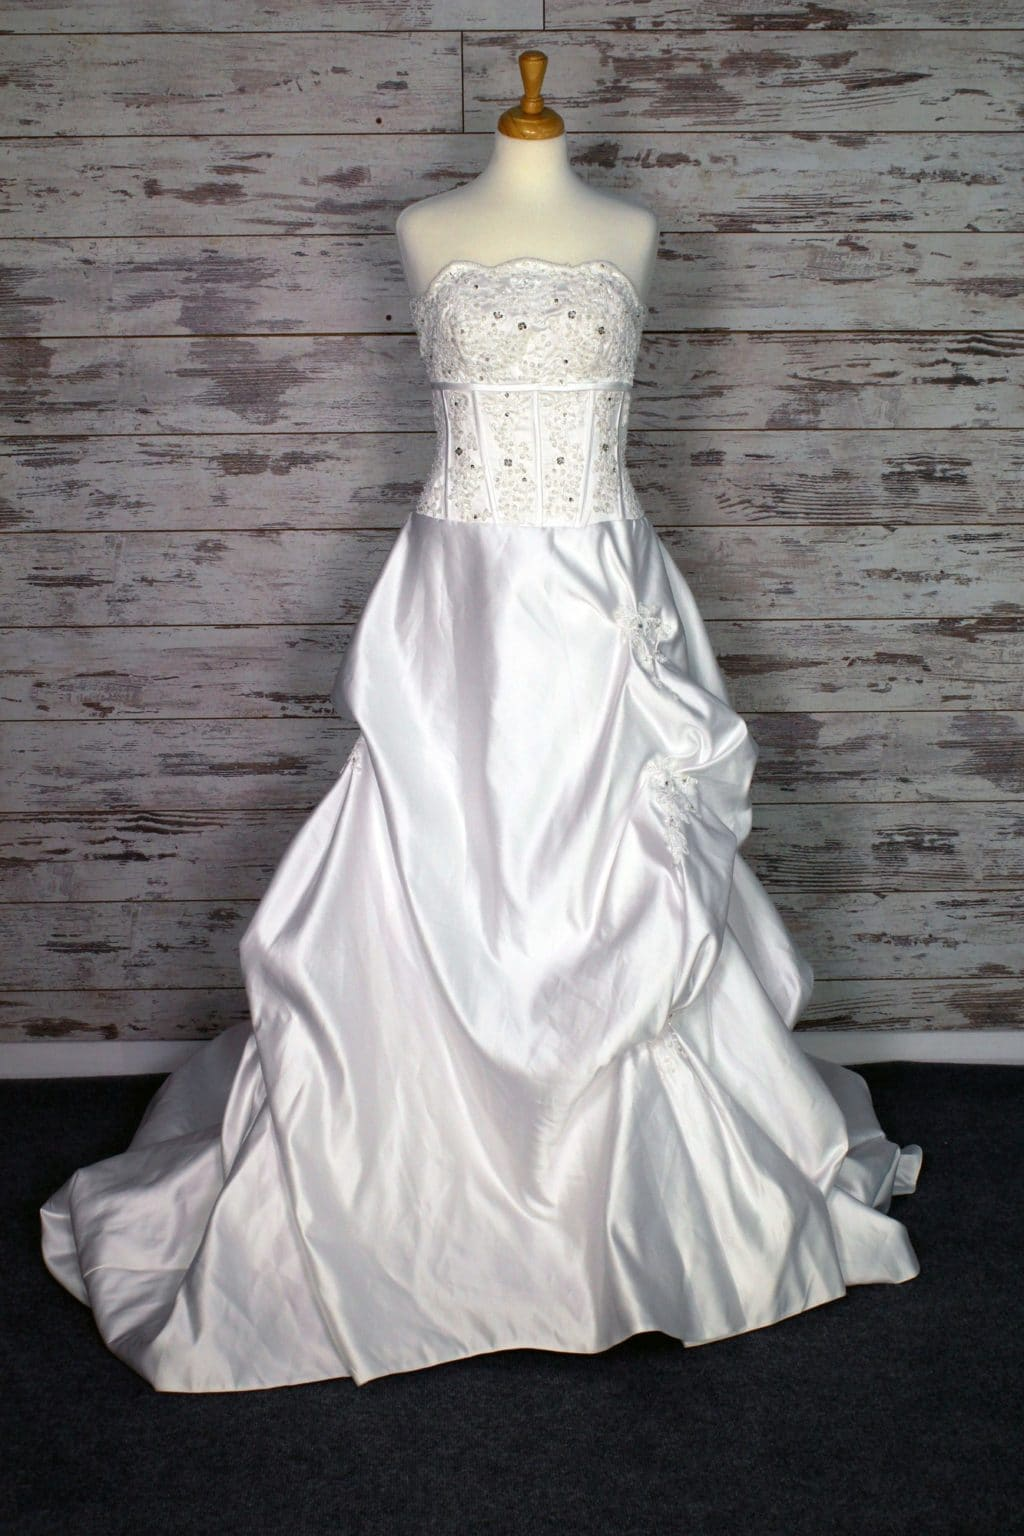 Private label v neck wedding dress size 10 for Private label wedding dresses